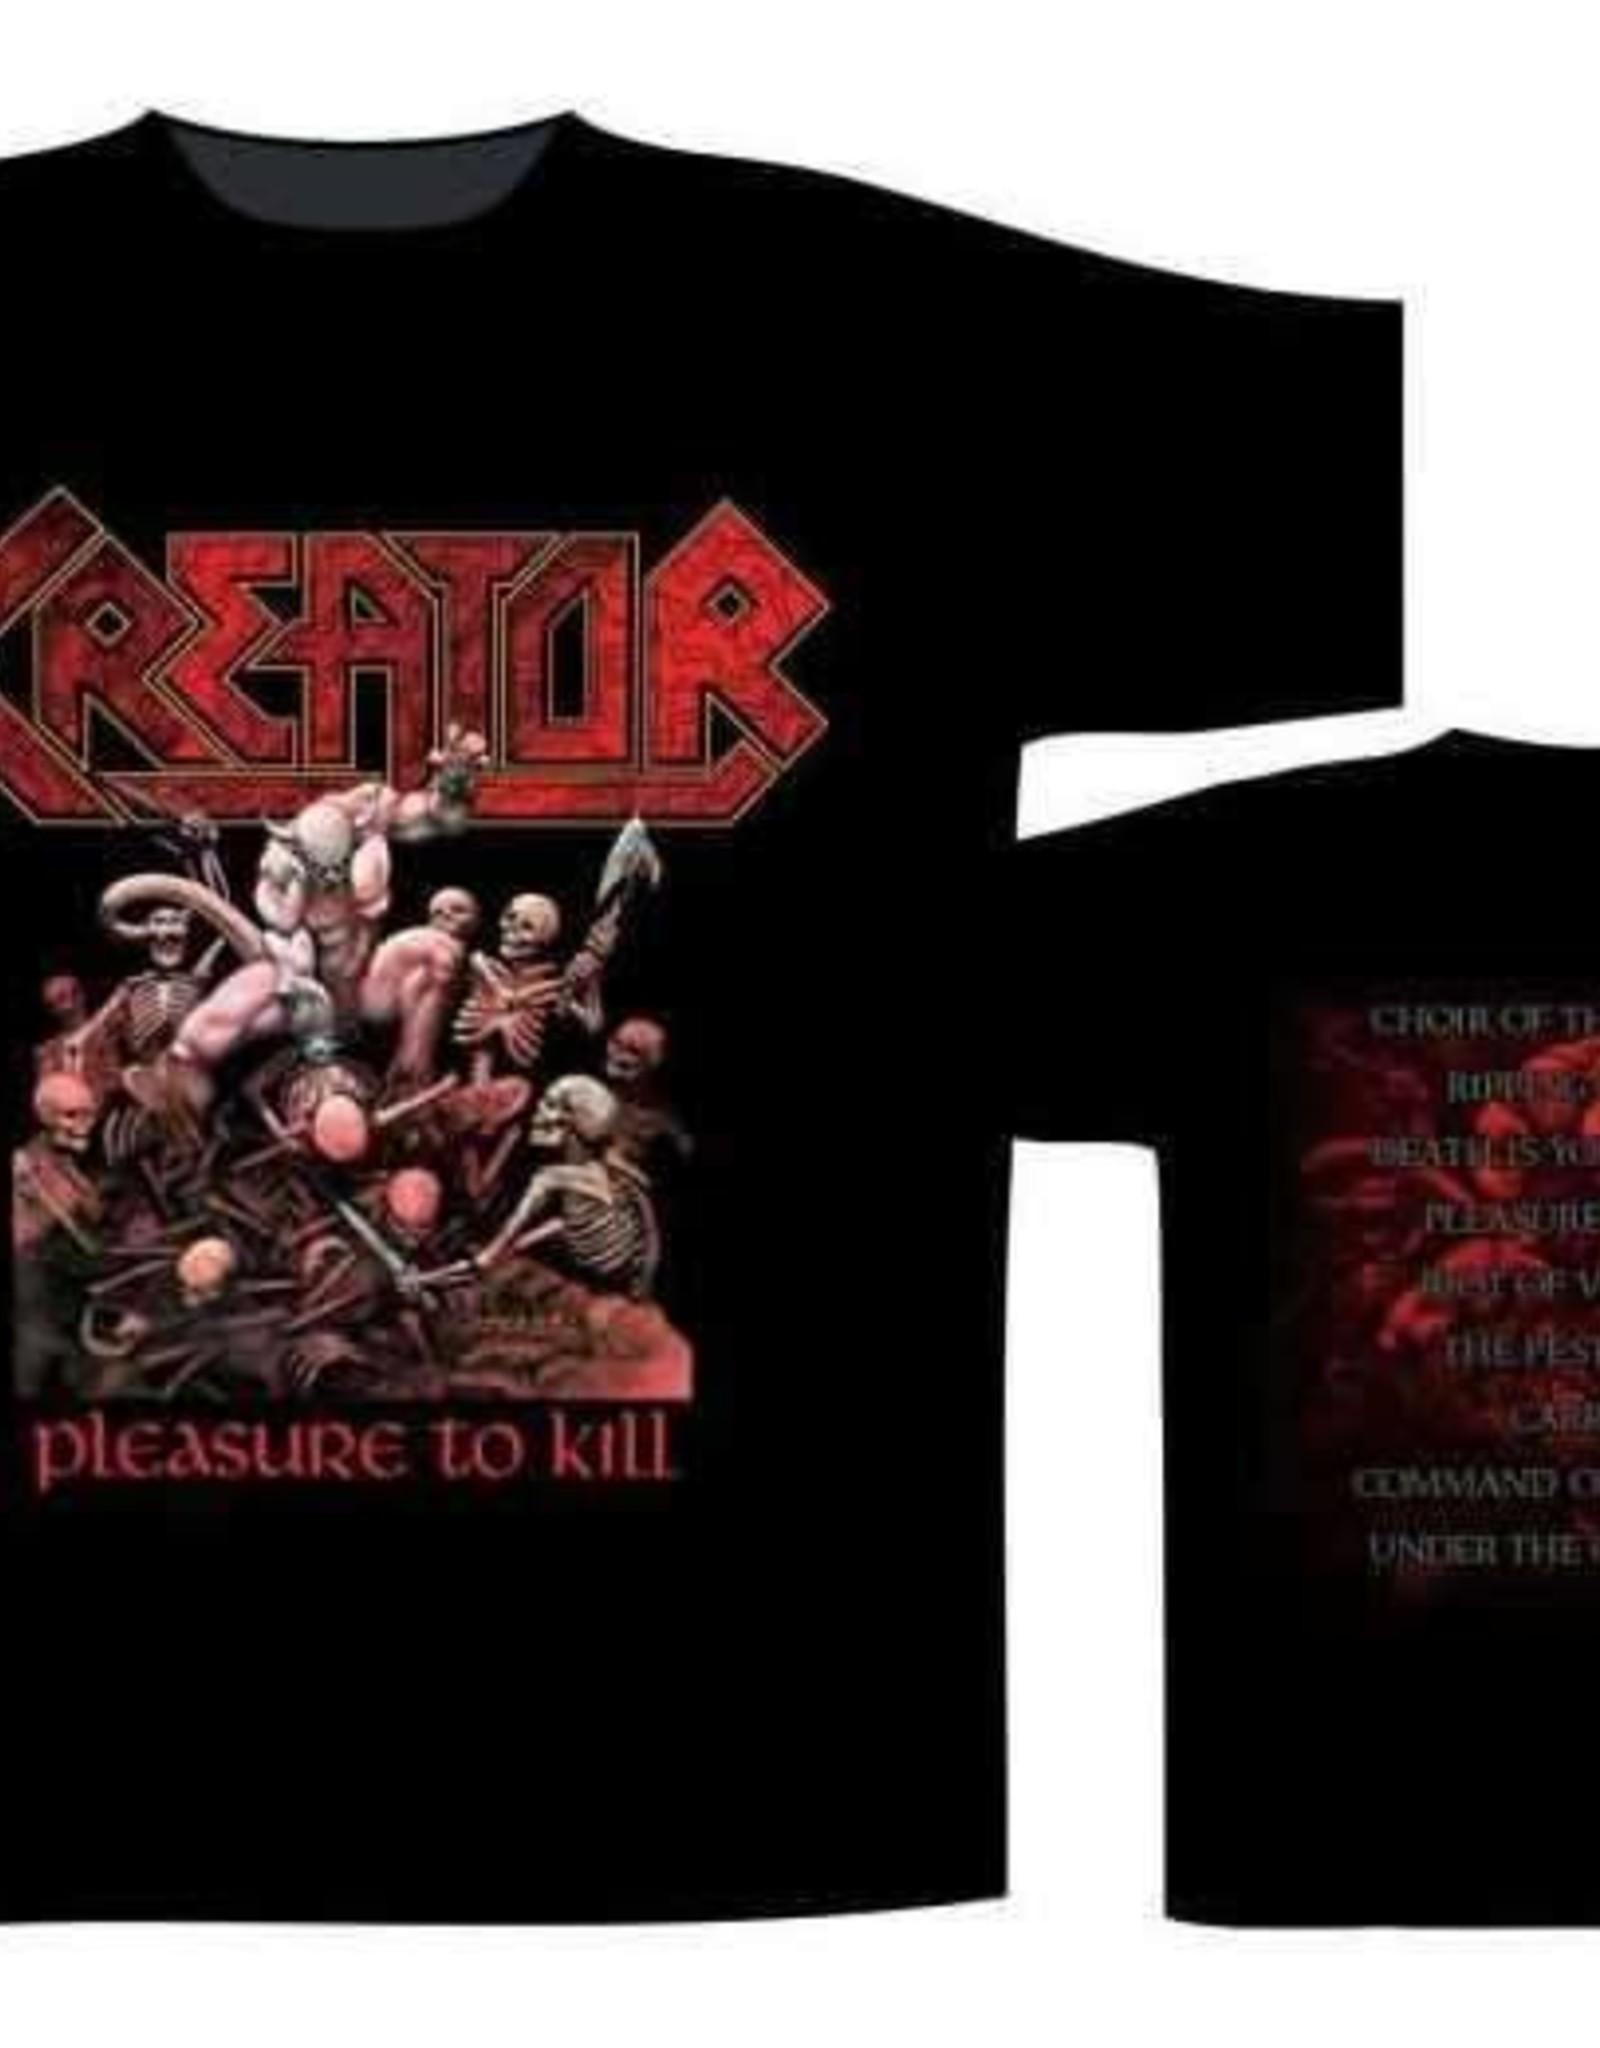 Kreator Pleasure To Kill T-Shirt